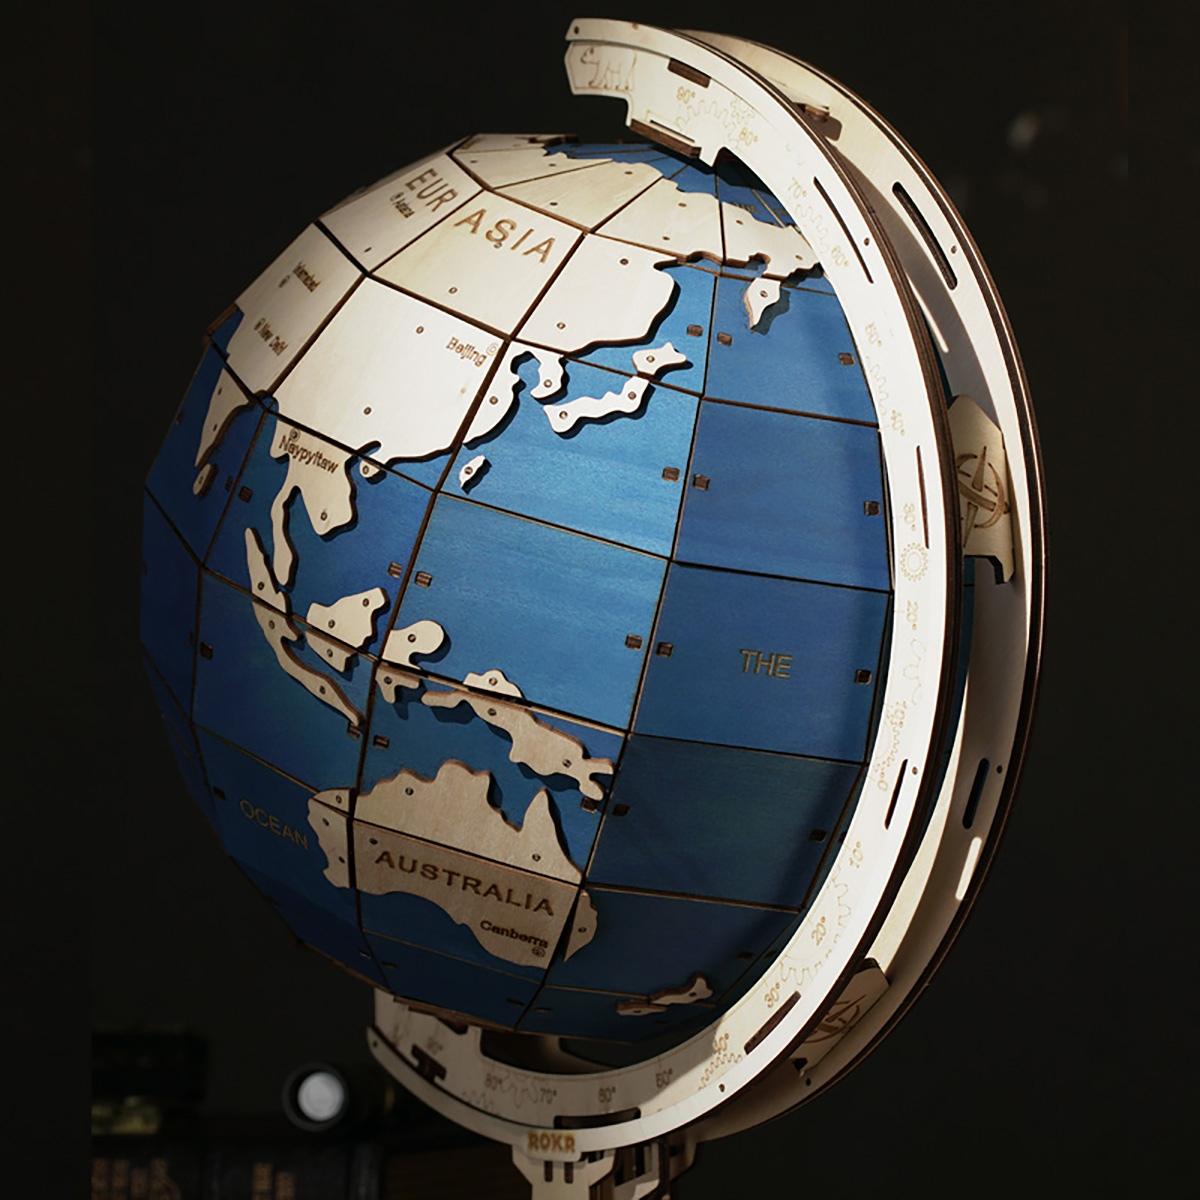 Laser Cut Globe Jewelry Box Free Vector